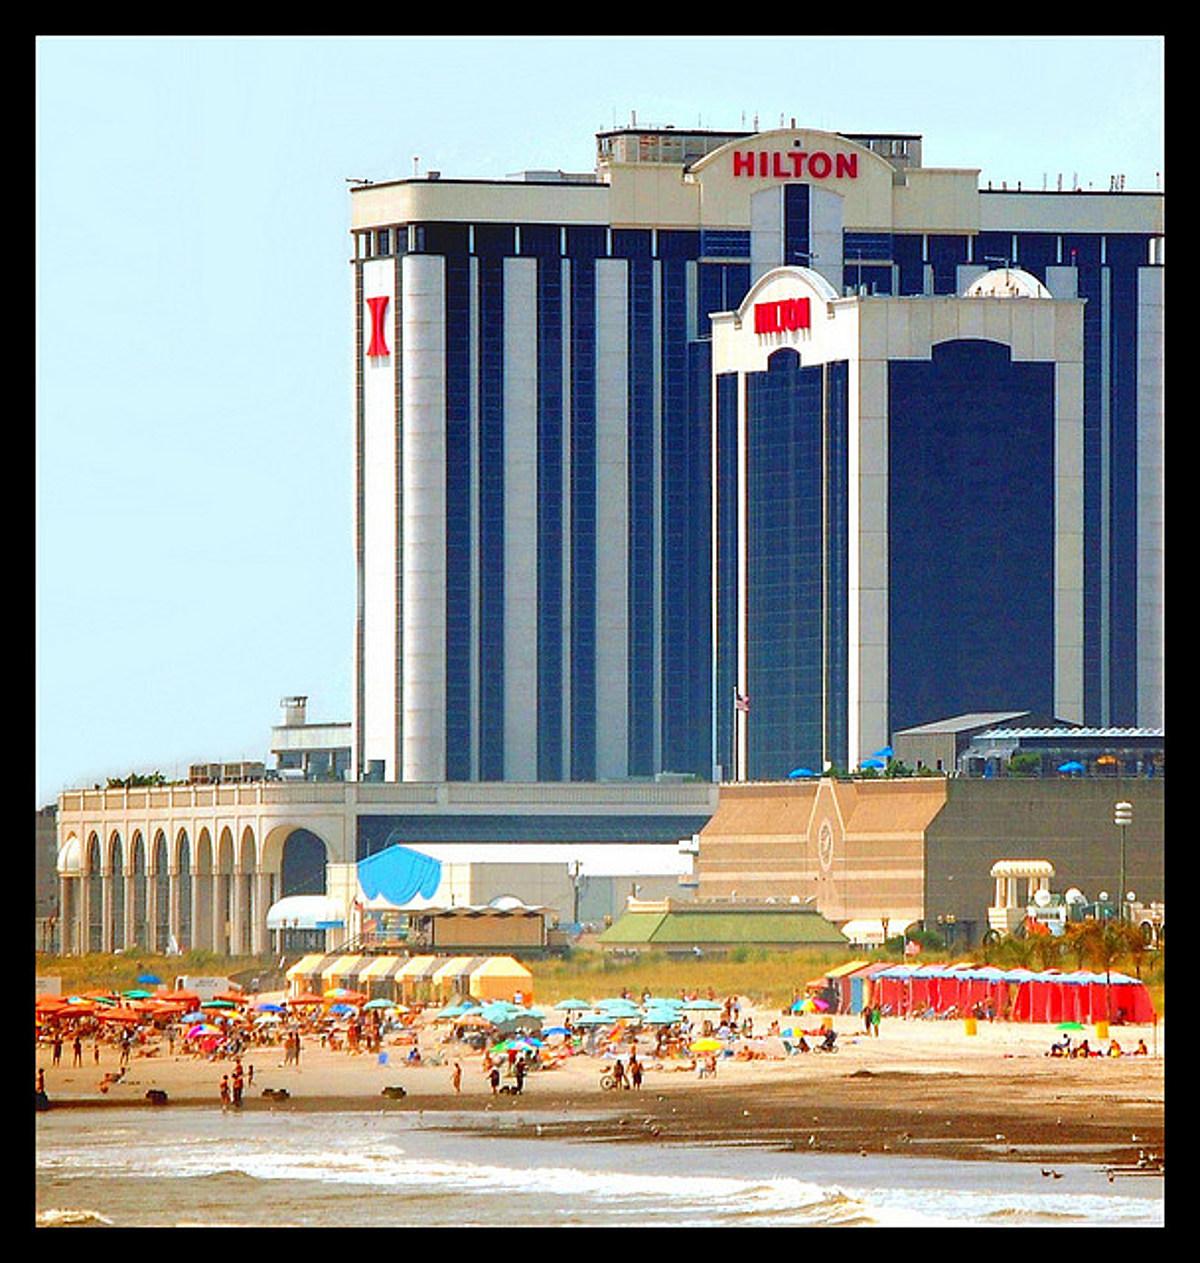 Hilton Atlantic City